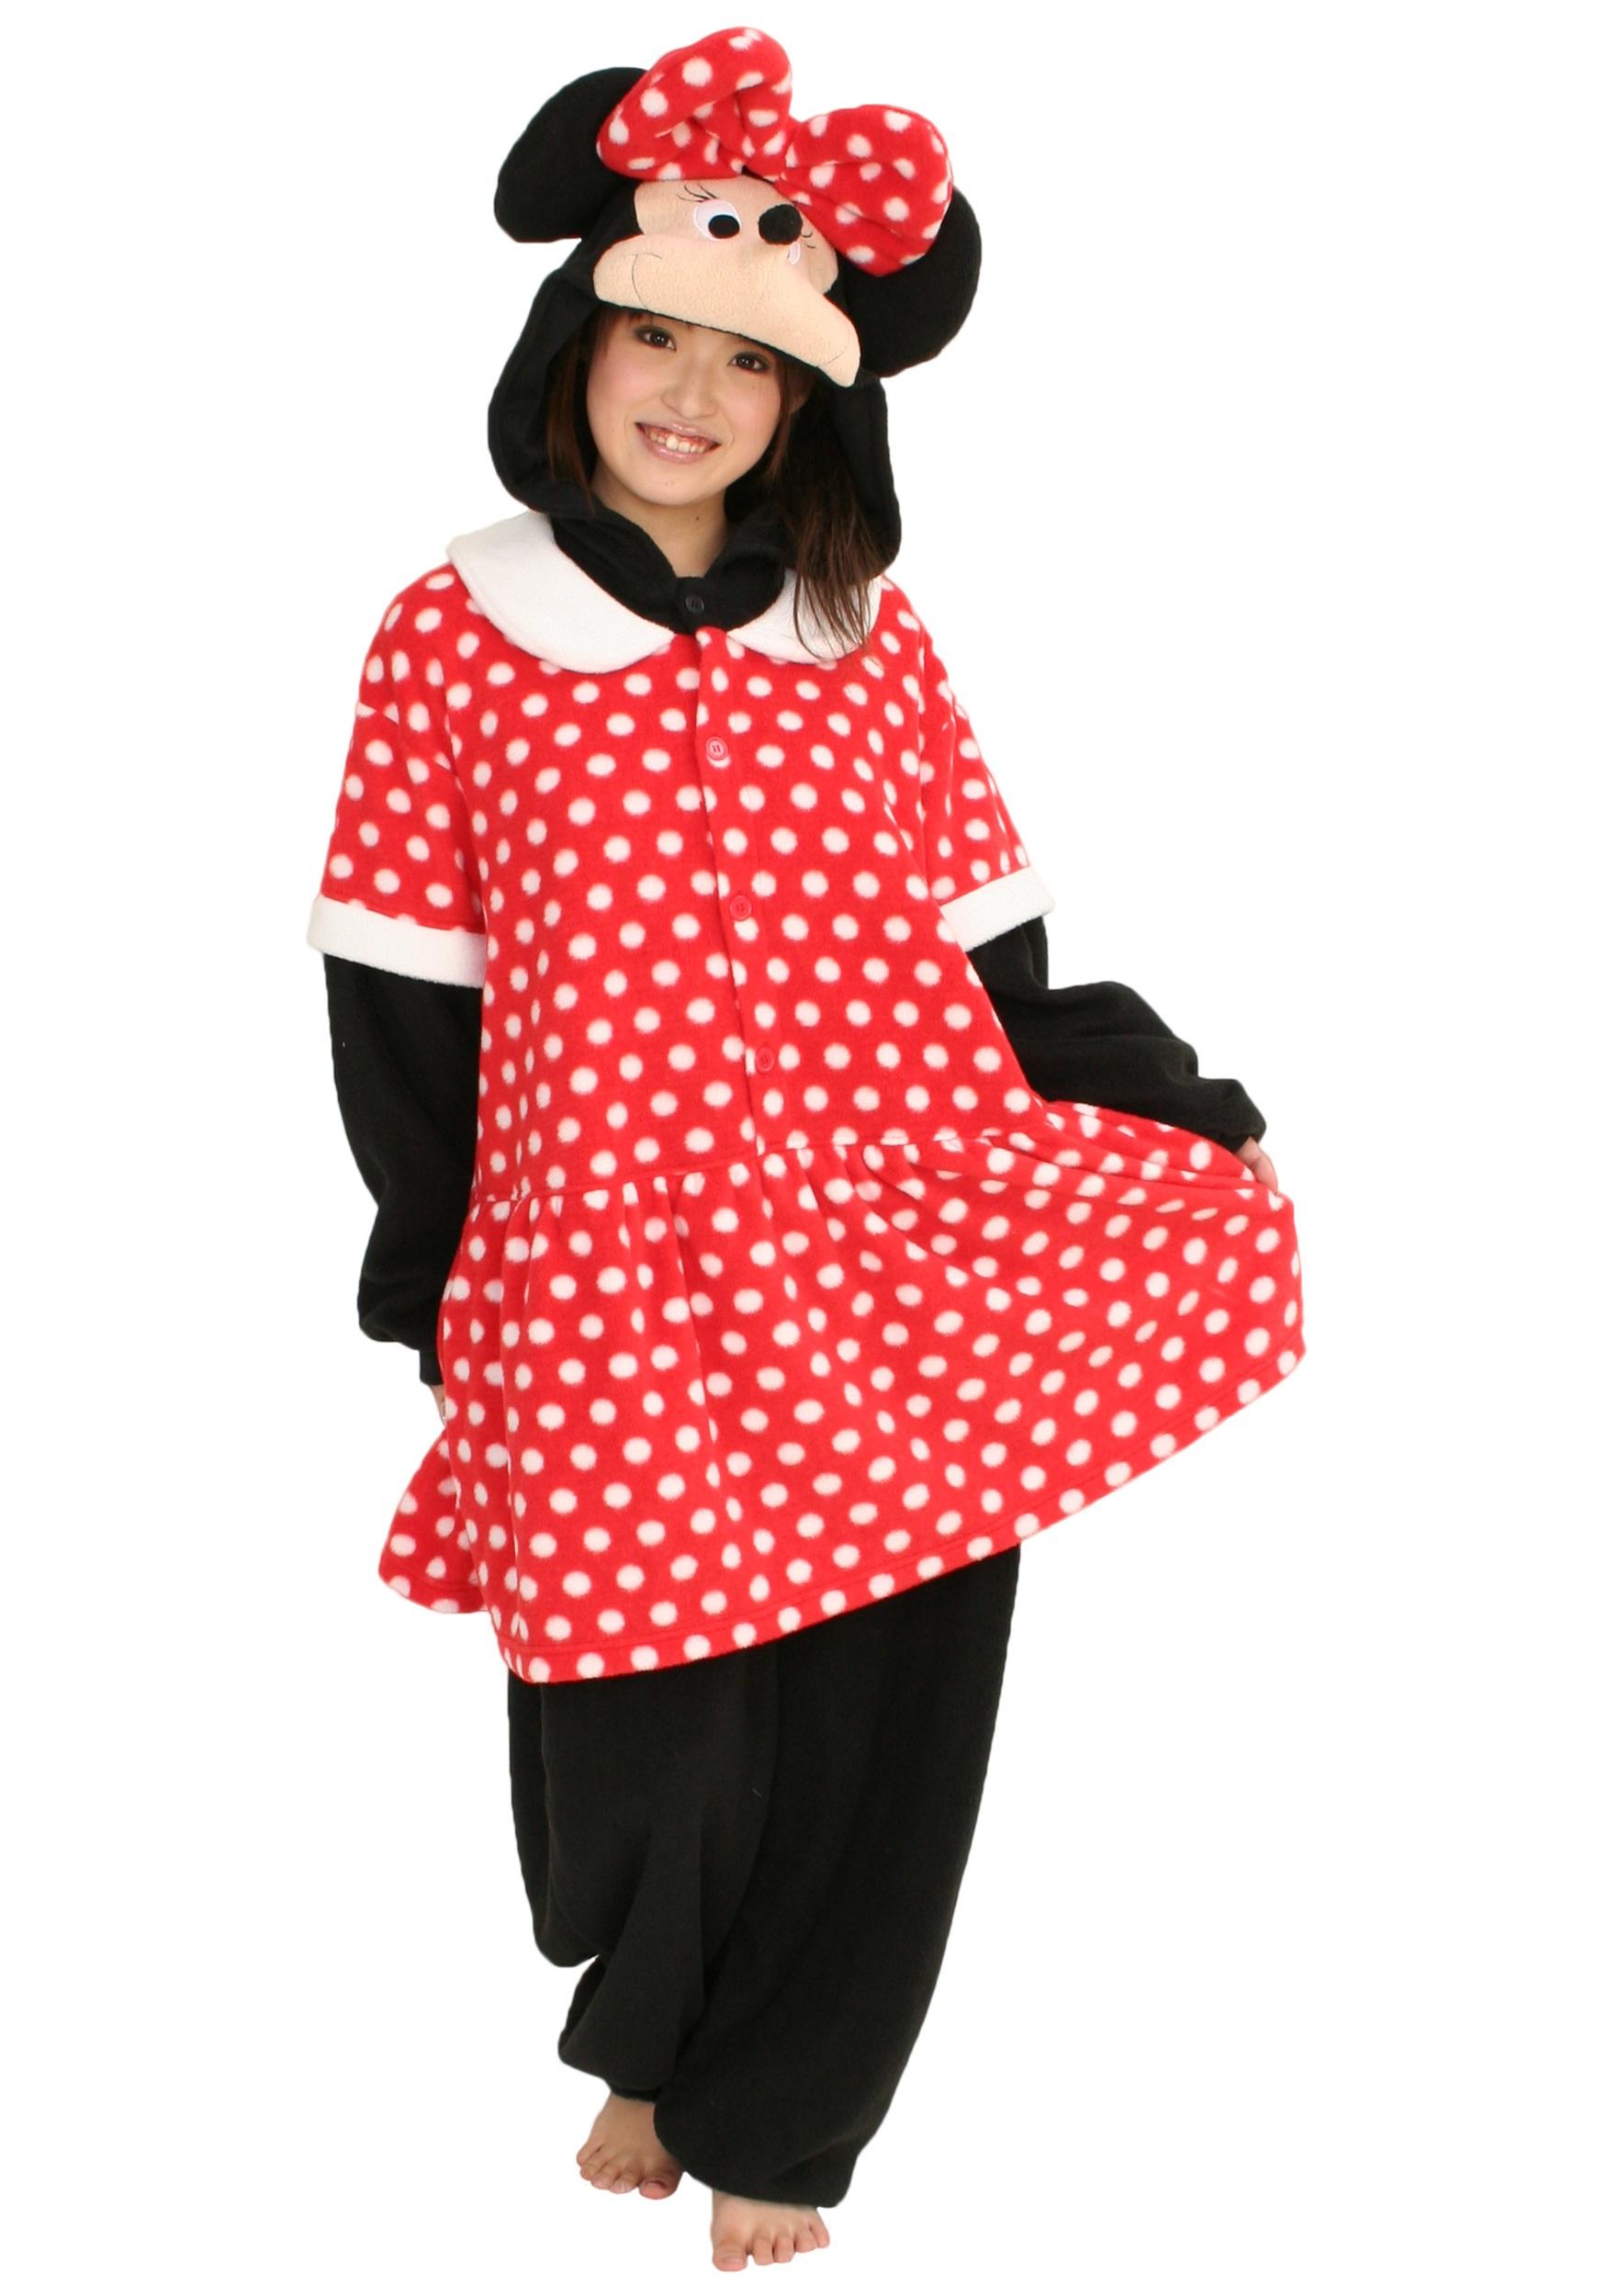 313feceae94d Minnie Mouse Pajama Costume